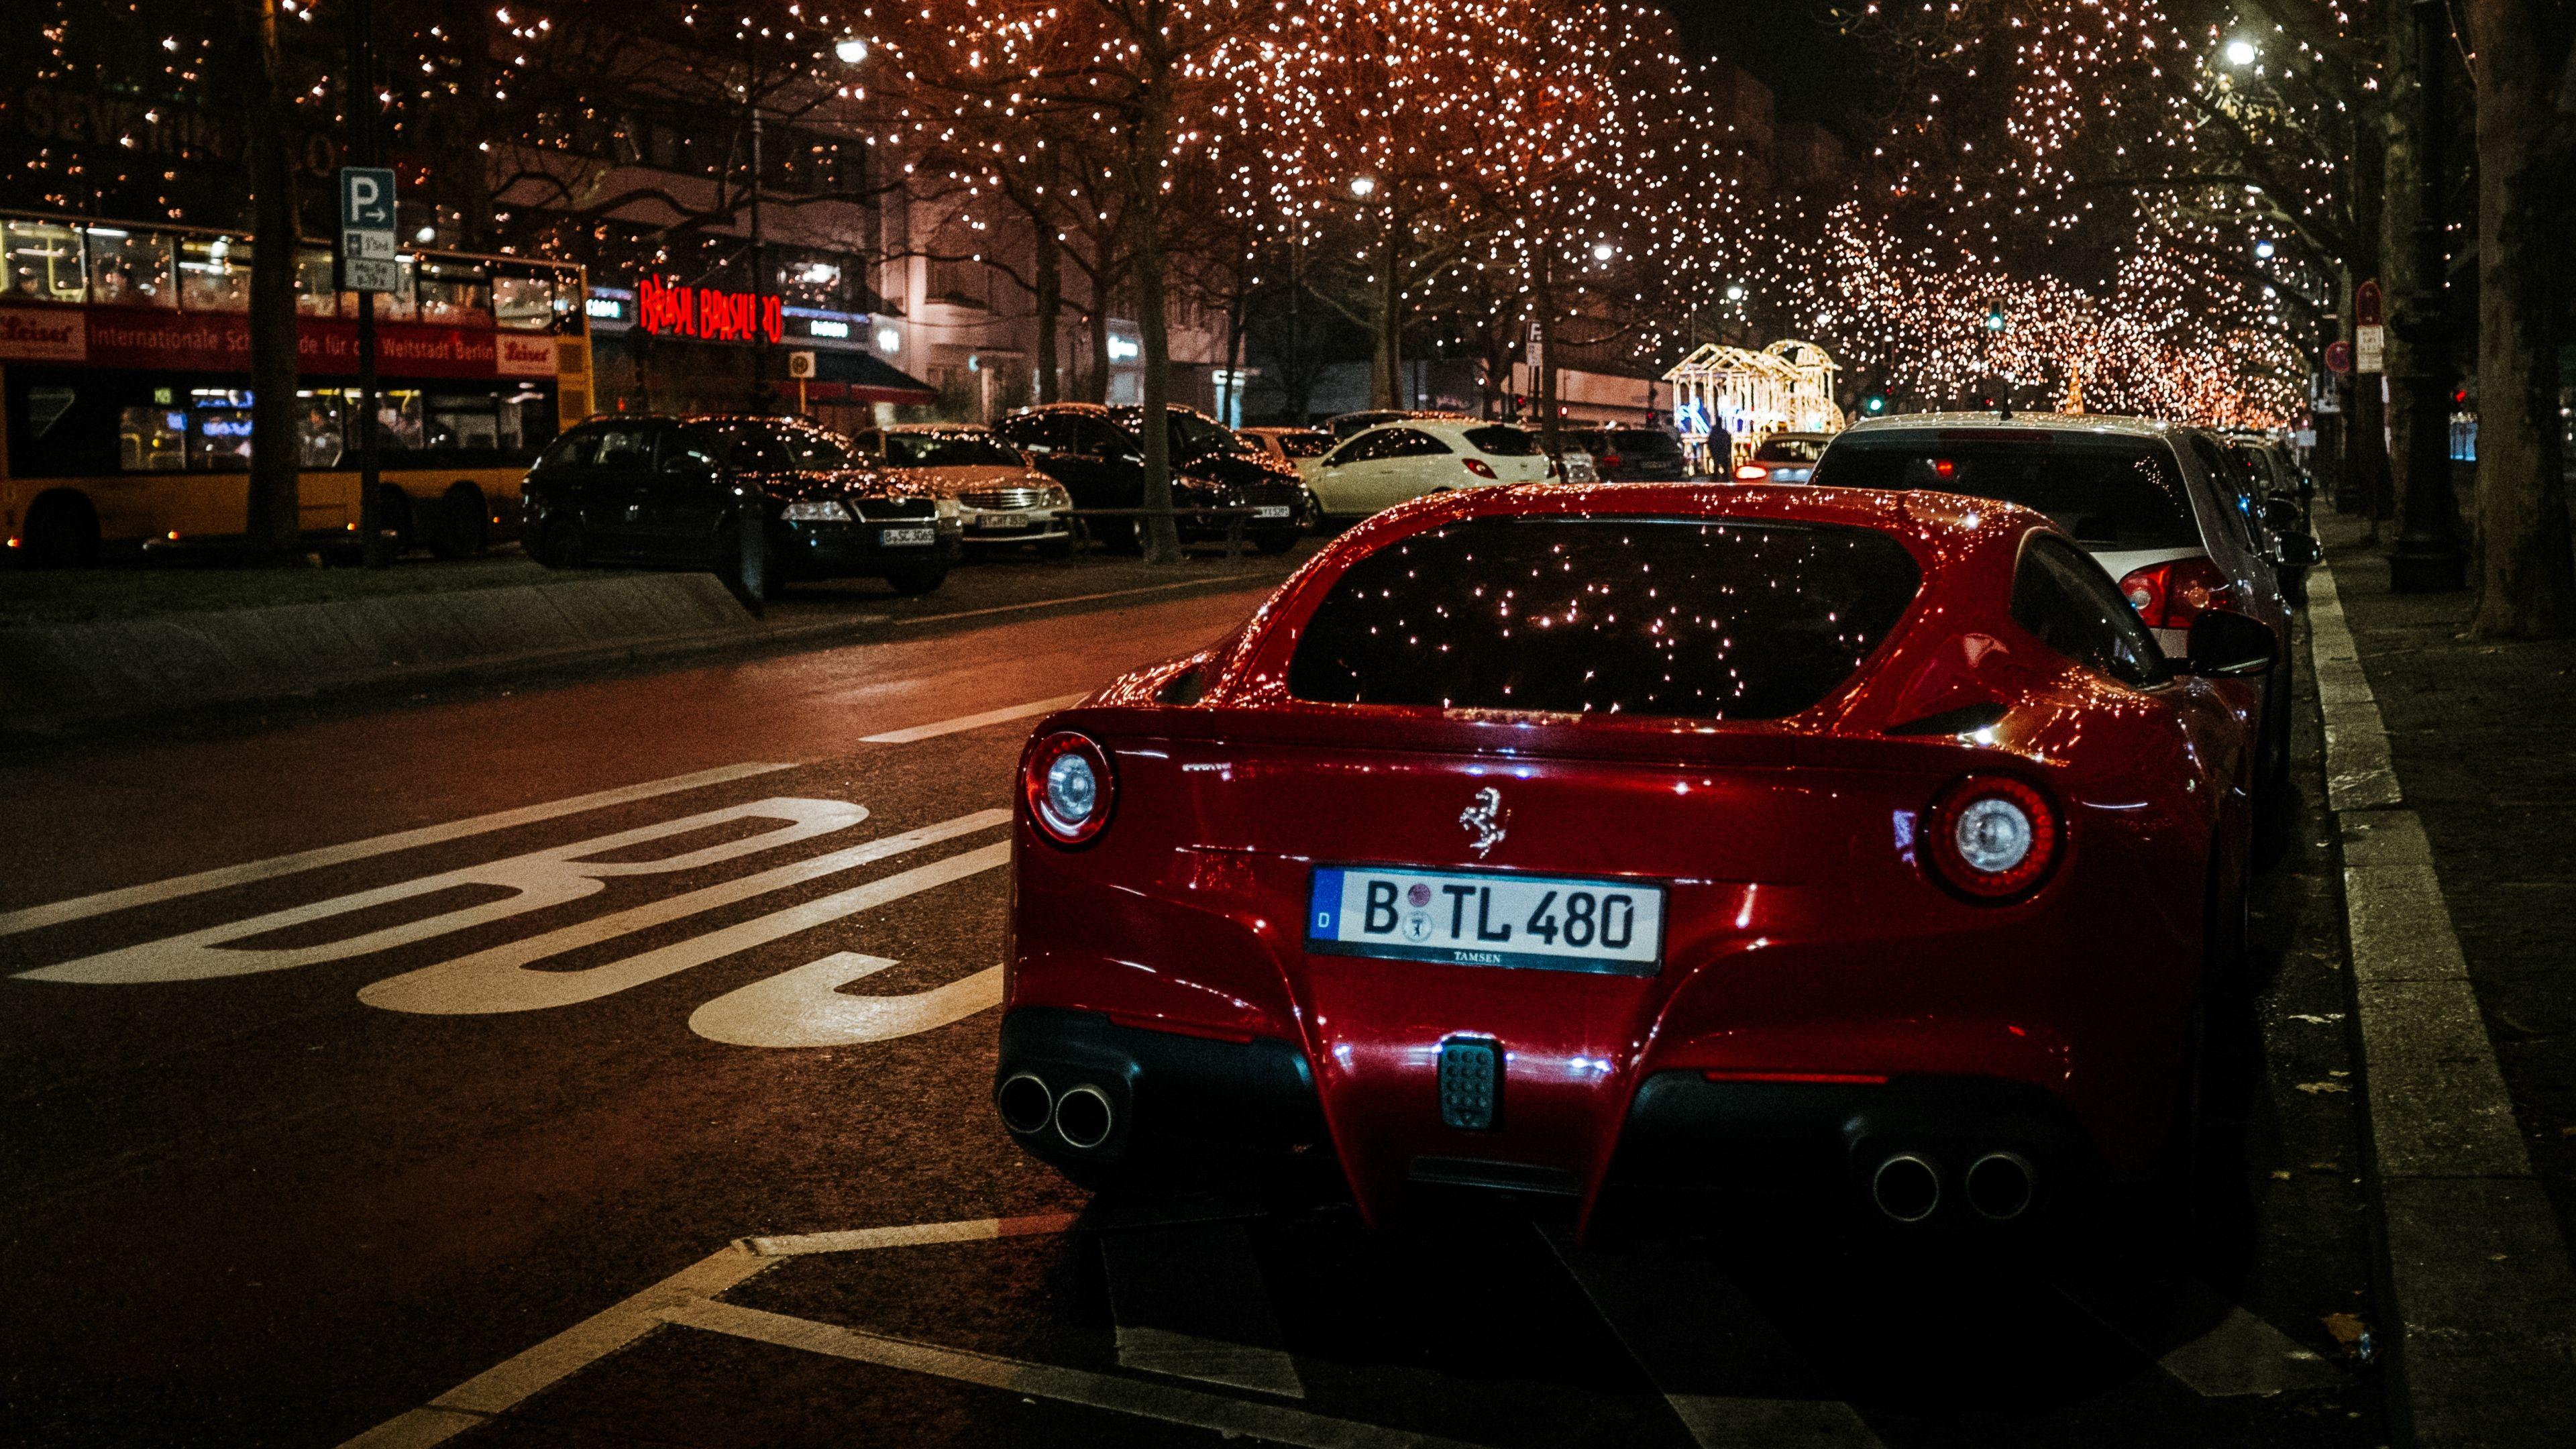 Wallpaper 4k Ferrari Rear View Red Night City Scenery 4k